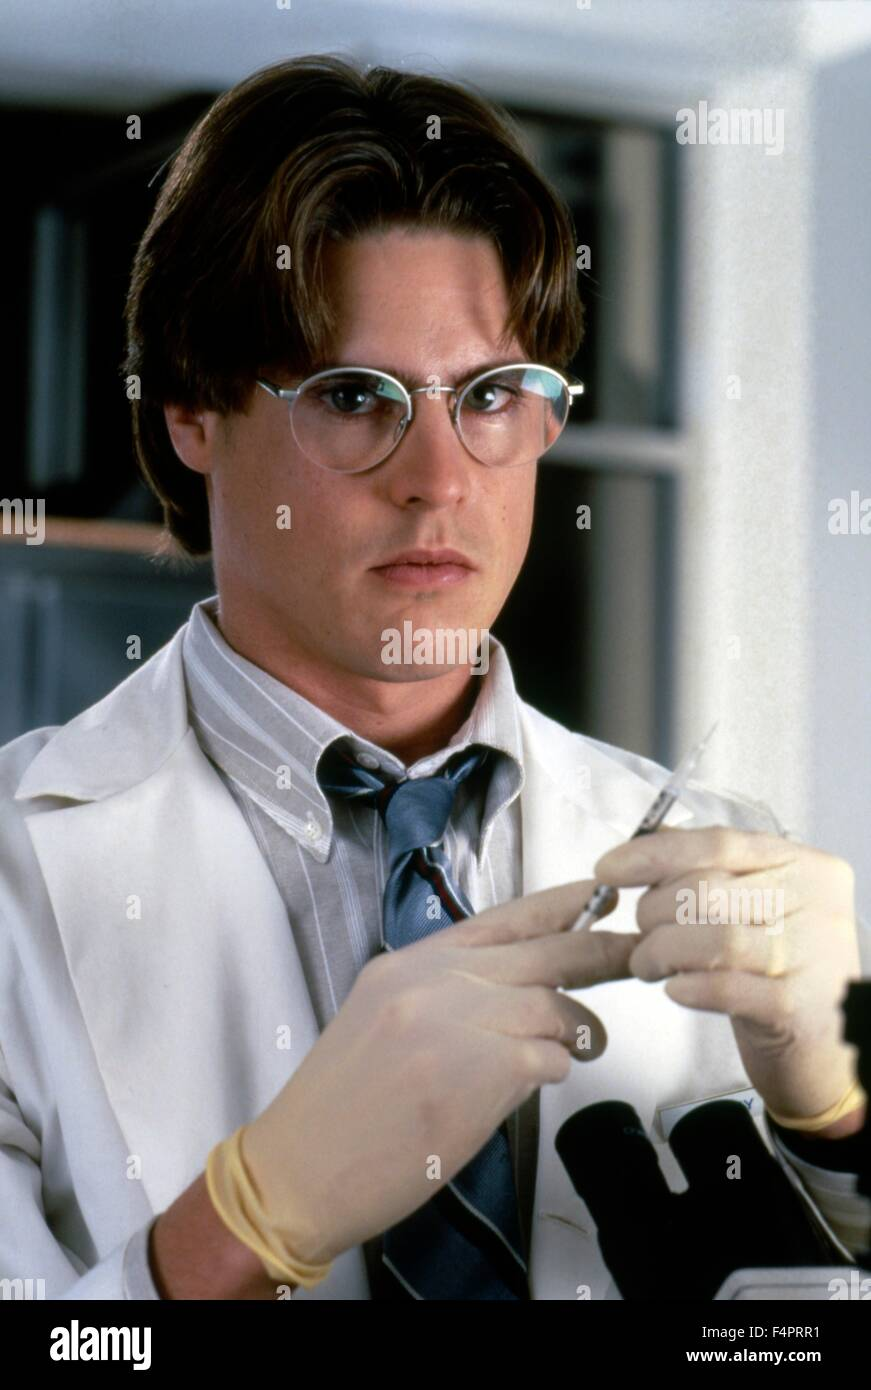 William McNamara / Copycat / 1995 directed by Jon Amiel [Warner Bros. Pictures] - Stock Image